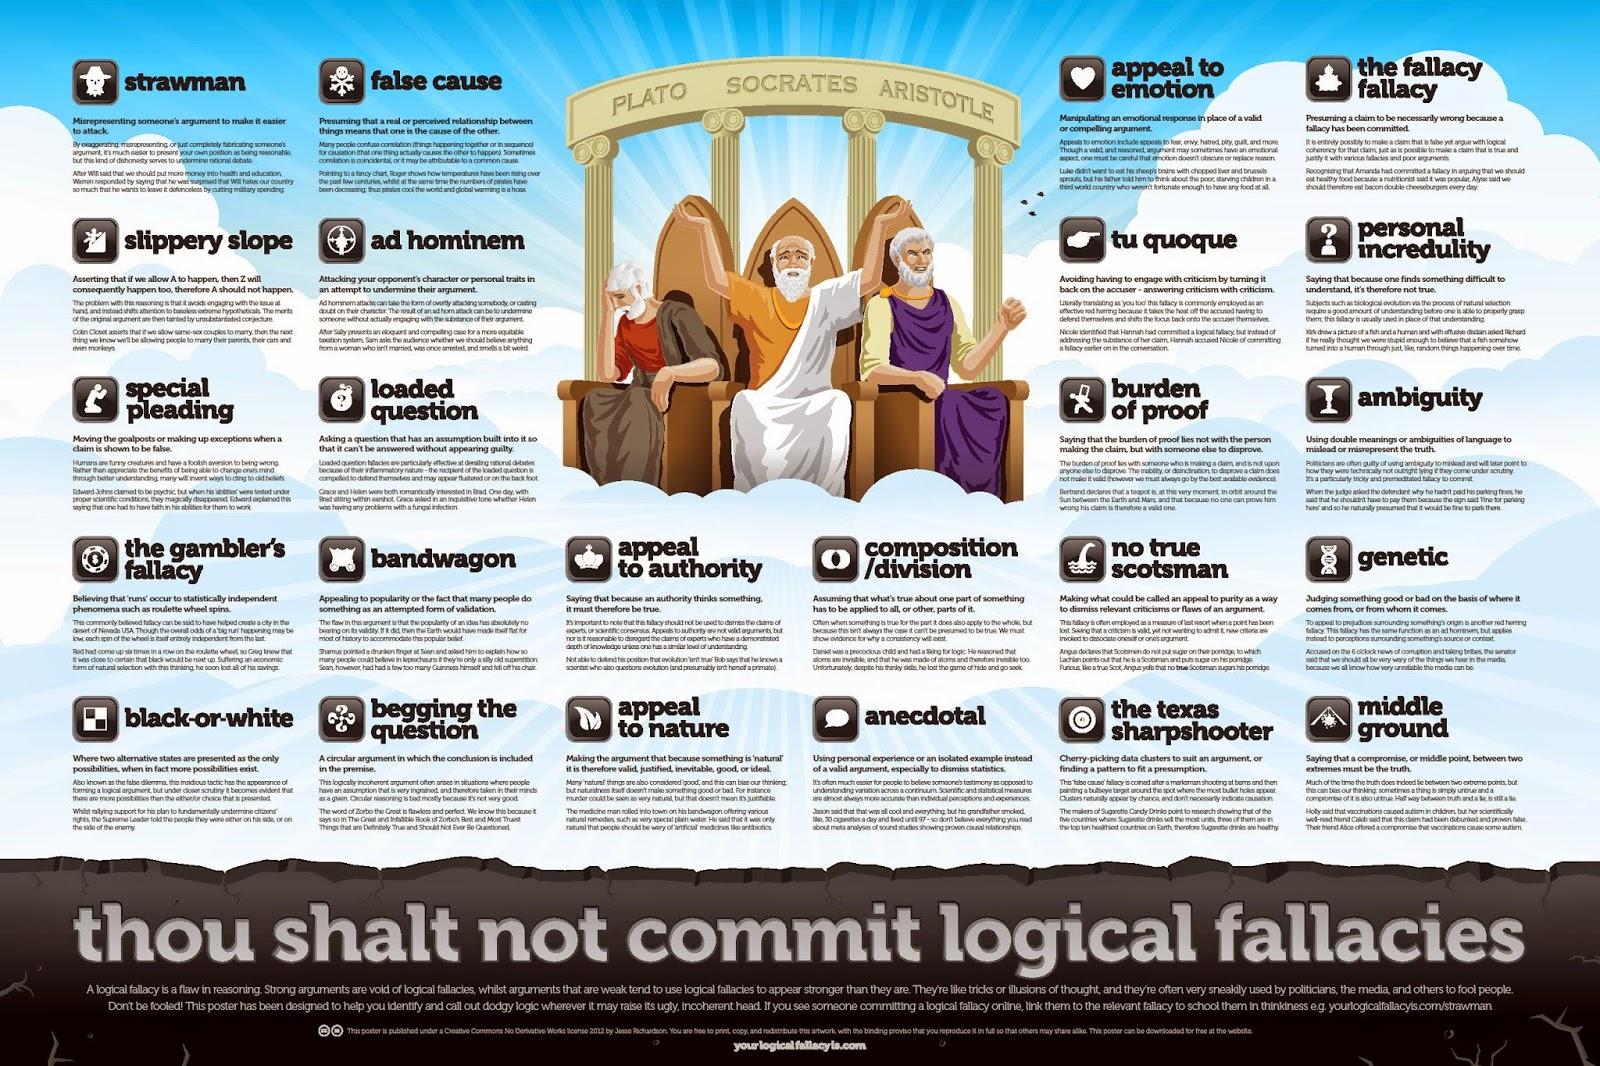 https://yourlogicalfallacyis.com/poster